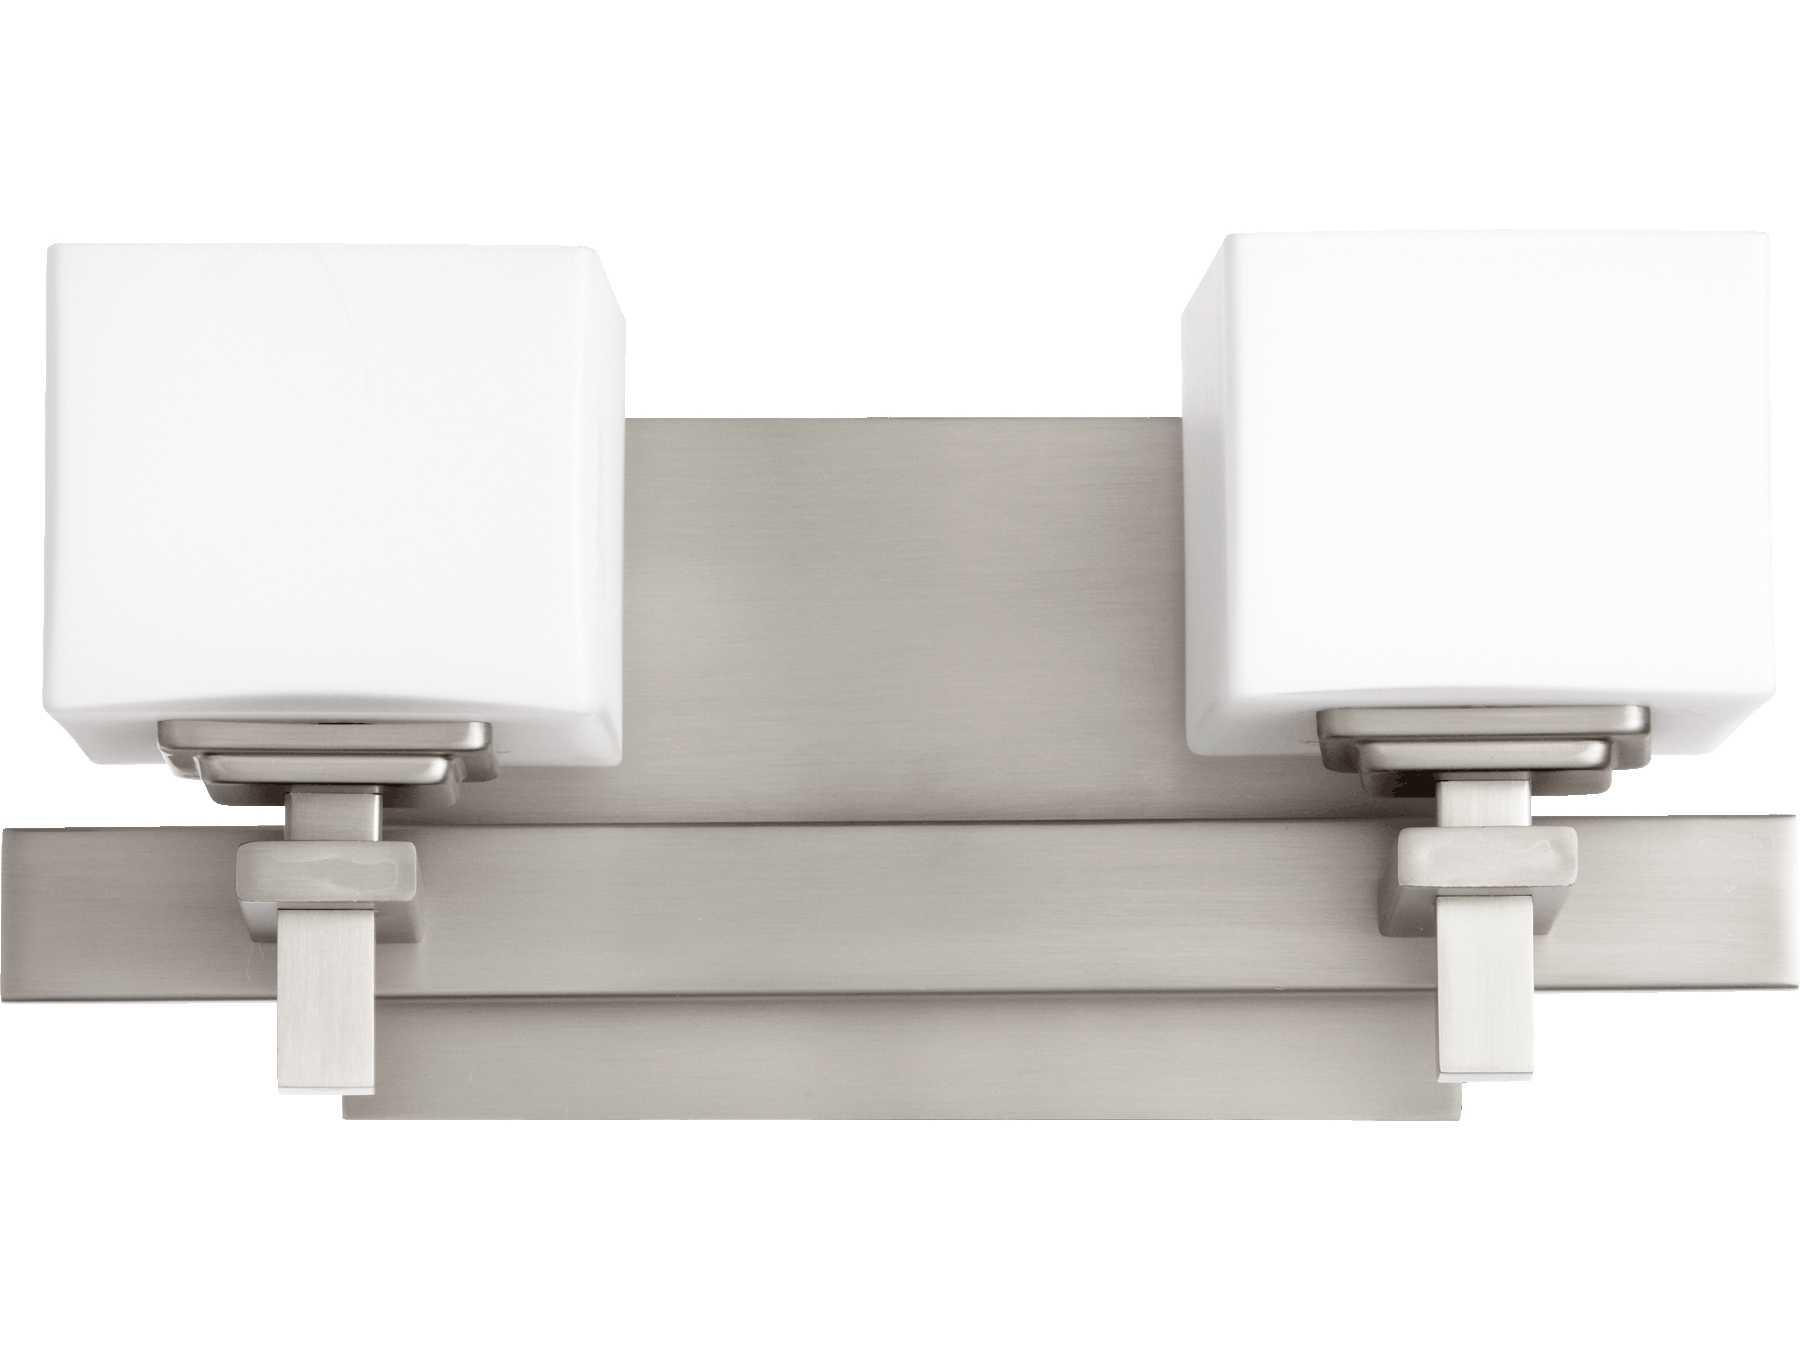 Quorum international satin nickel two lights wall sconce for International decor wall lights